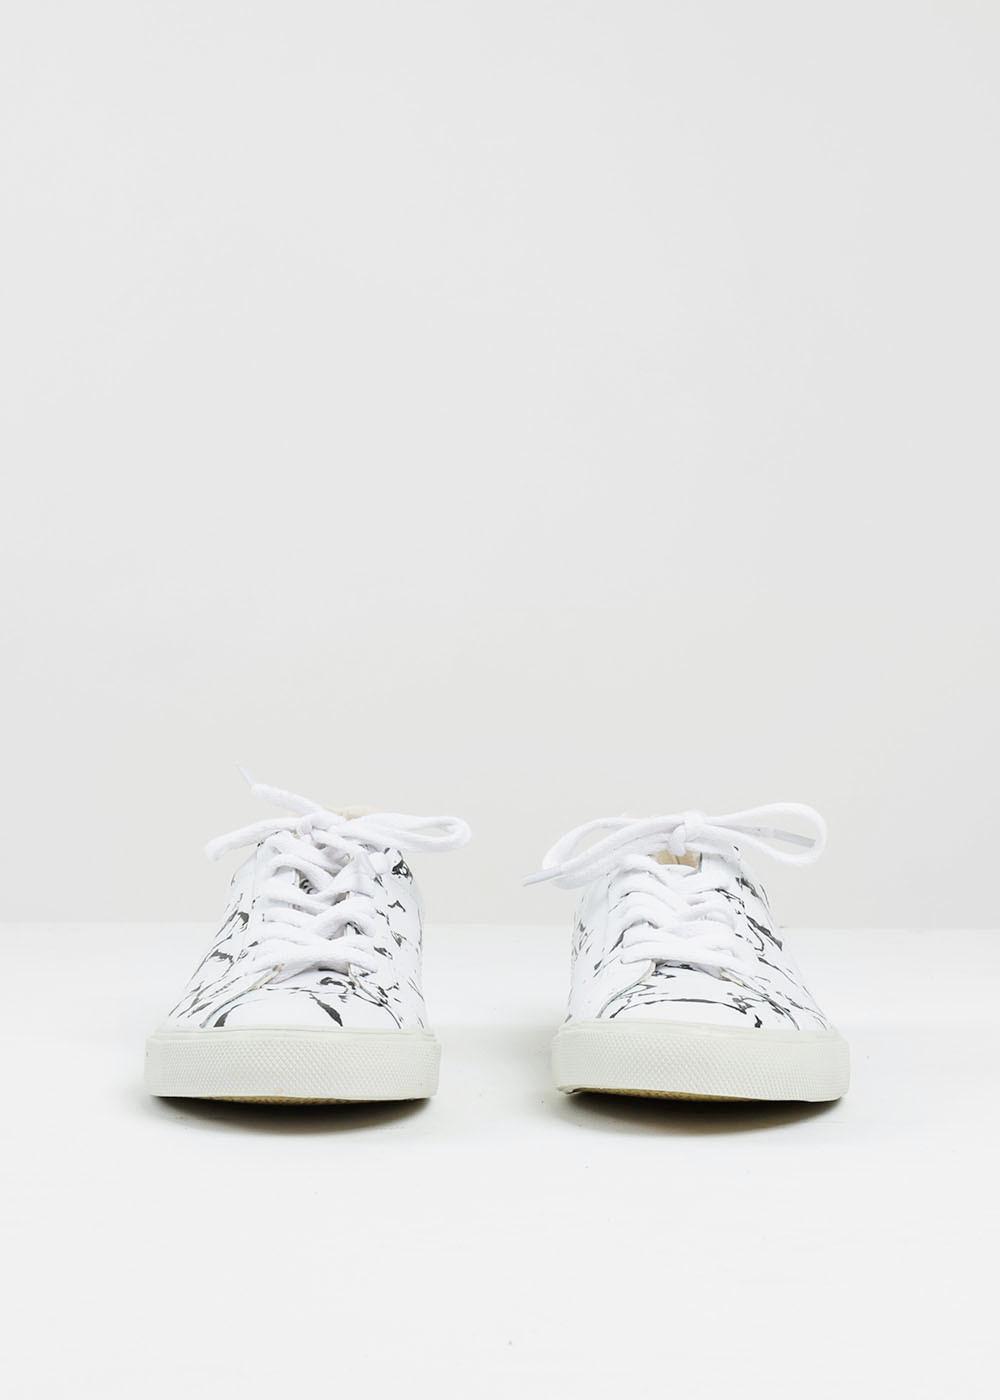 Veja Uma Low Leather Esplar Sneakers Garmentory